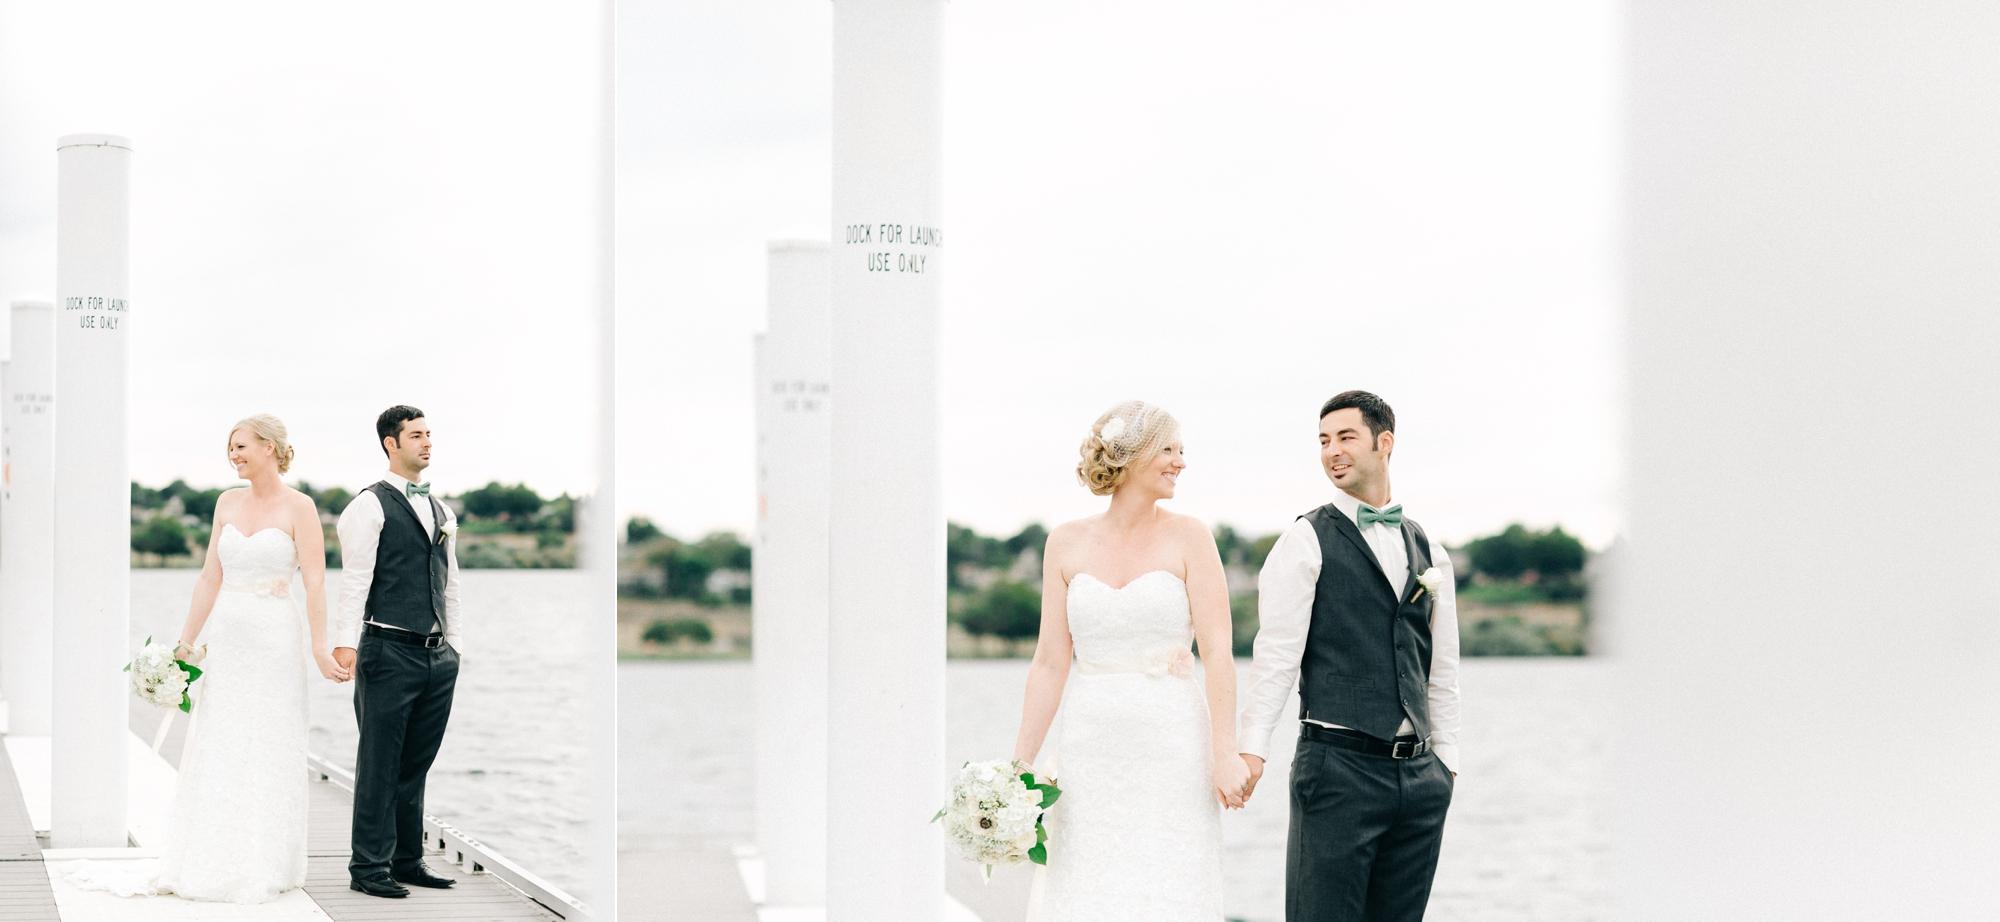 13_Backyard_Pasco_Washington_Wedding_Photo.JPG